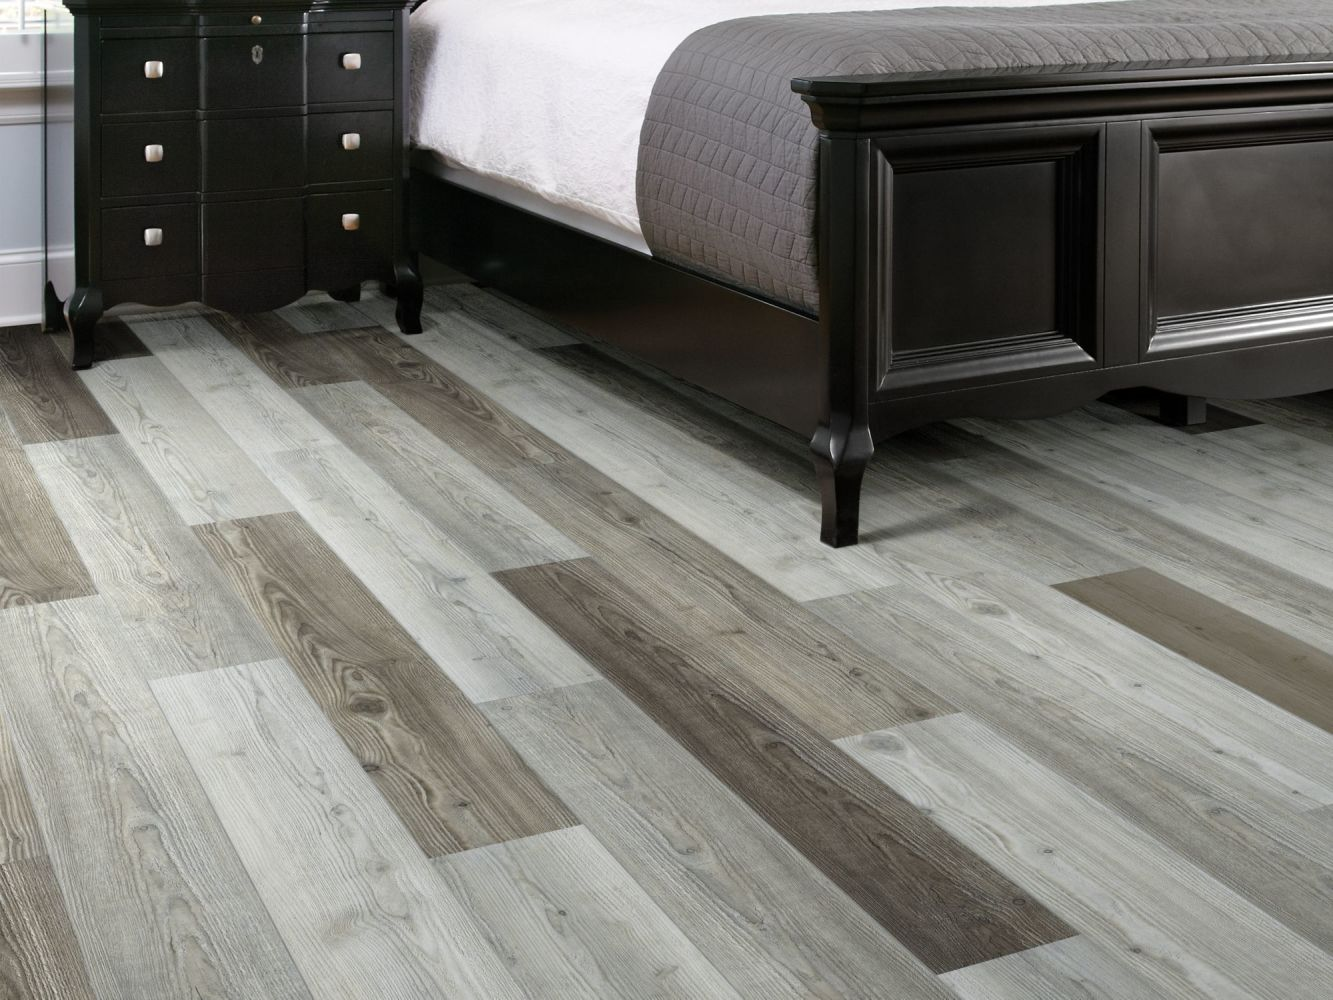 Shaw Floors Vinyl Residential Stature Plus Greyed Pine 05040_VE371